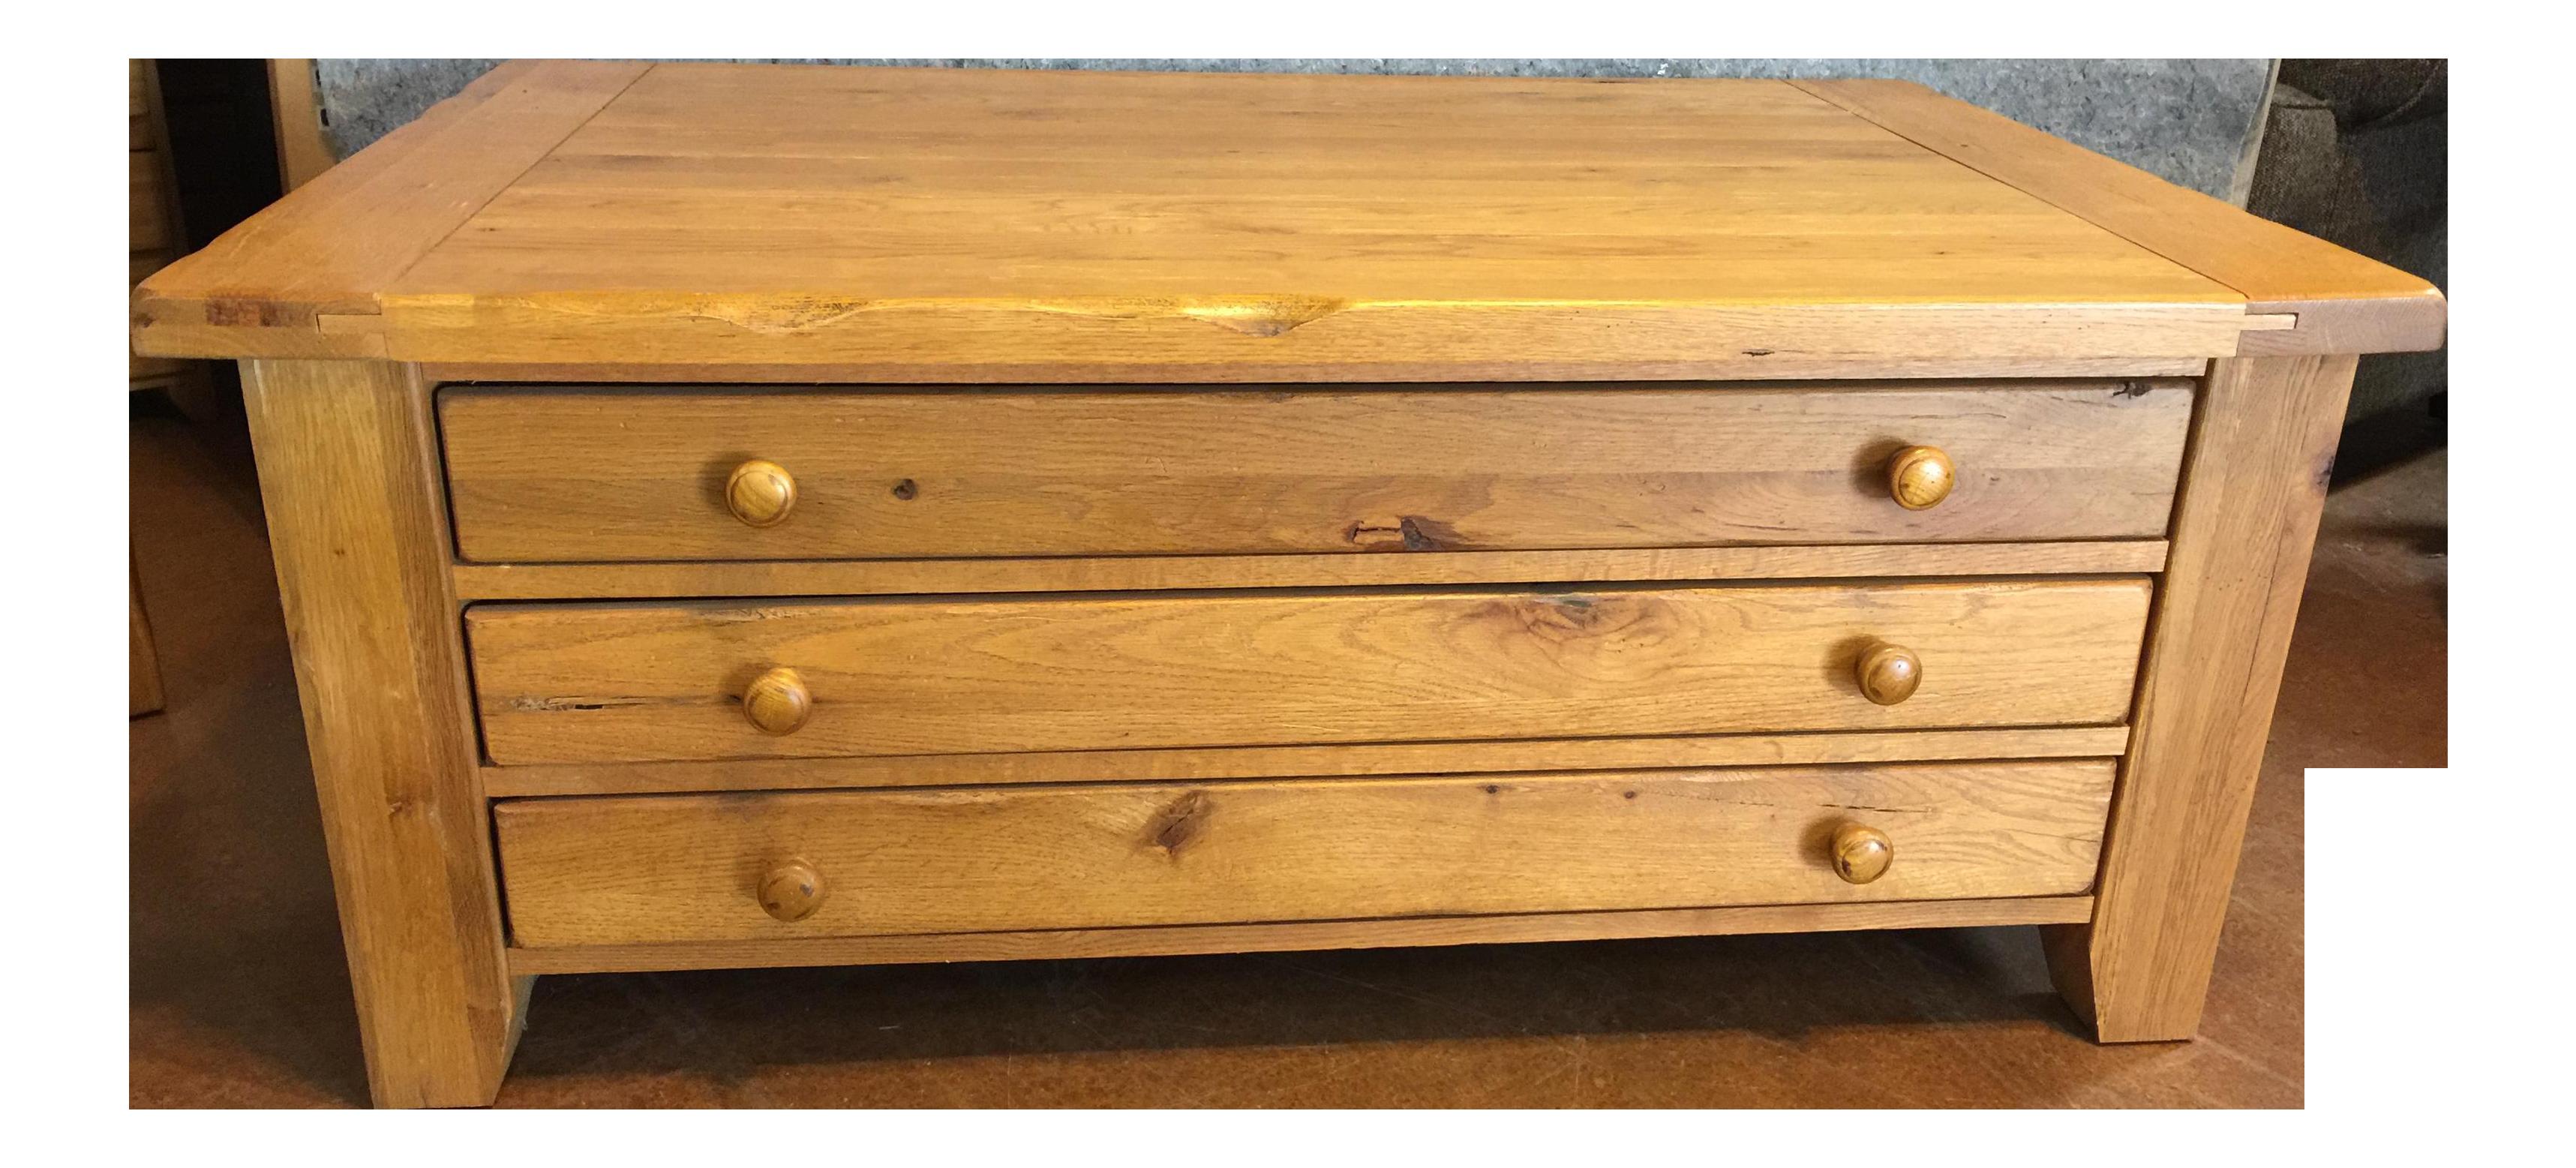 Vintage Used Lodge Coffee Tables Chairish